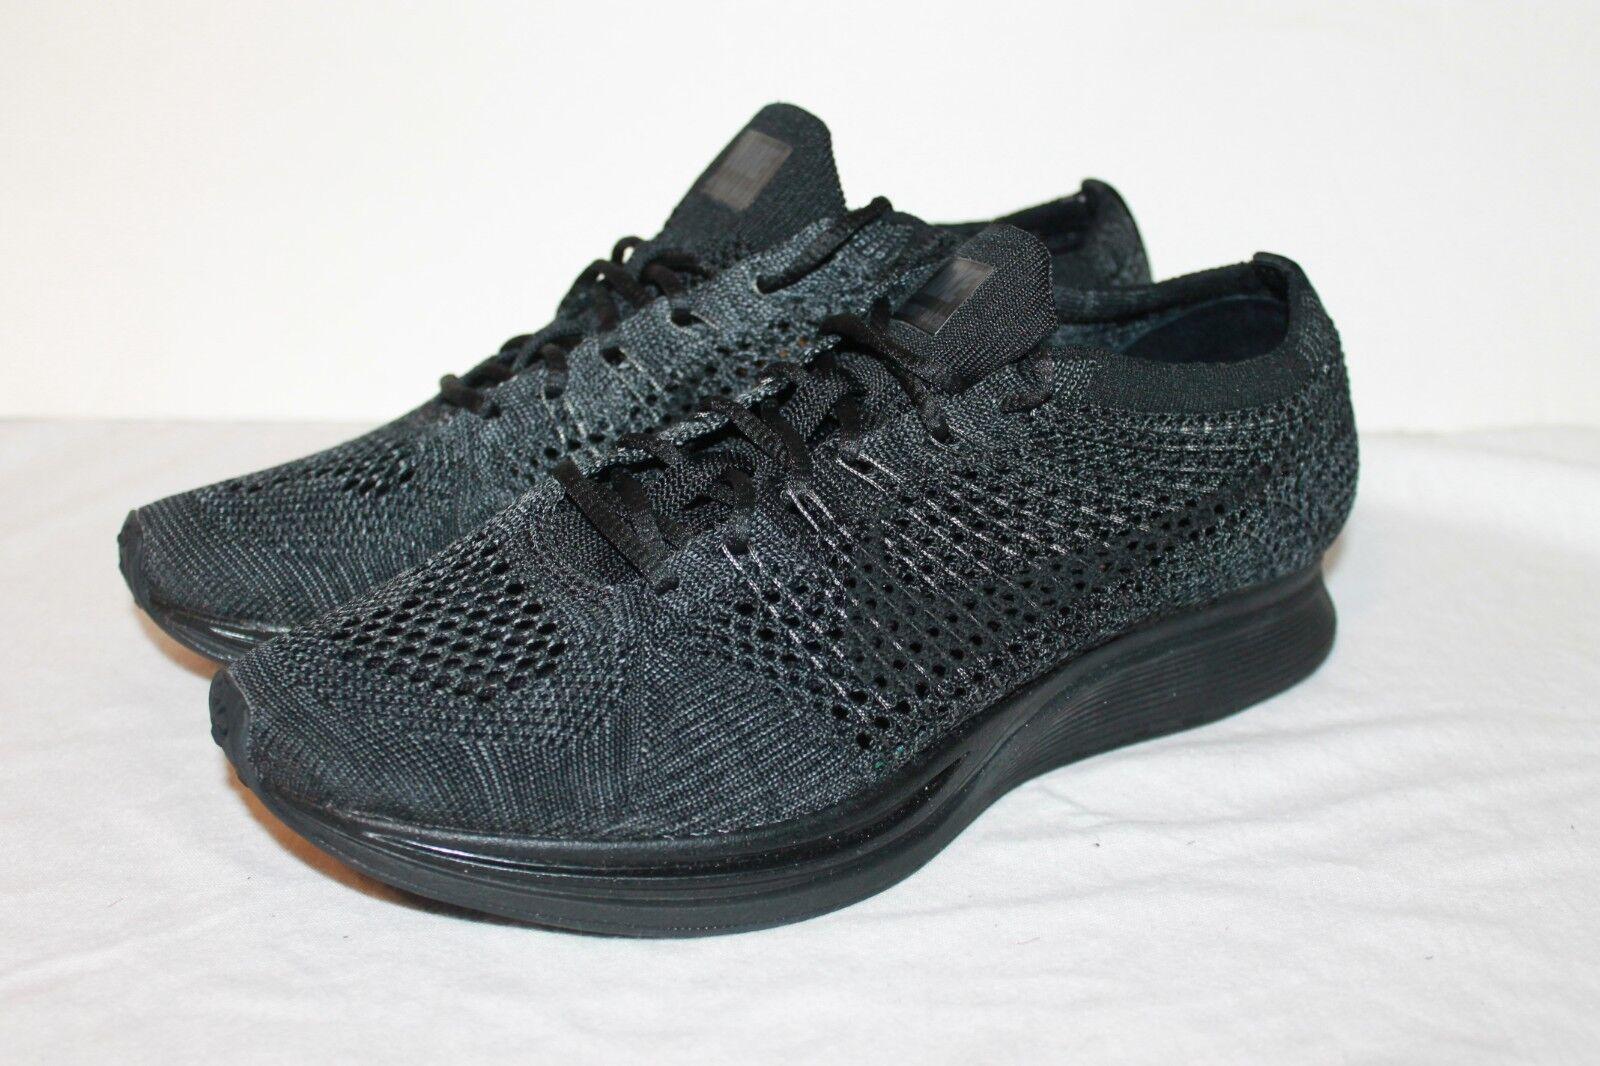 Nike Flyknit Racer Triple Black Anthracite 526628-009 US Size MEN 6.5 WOMEN 8